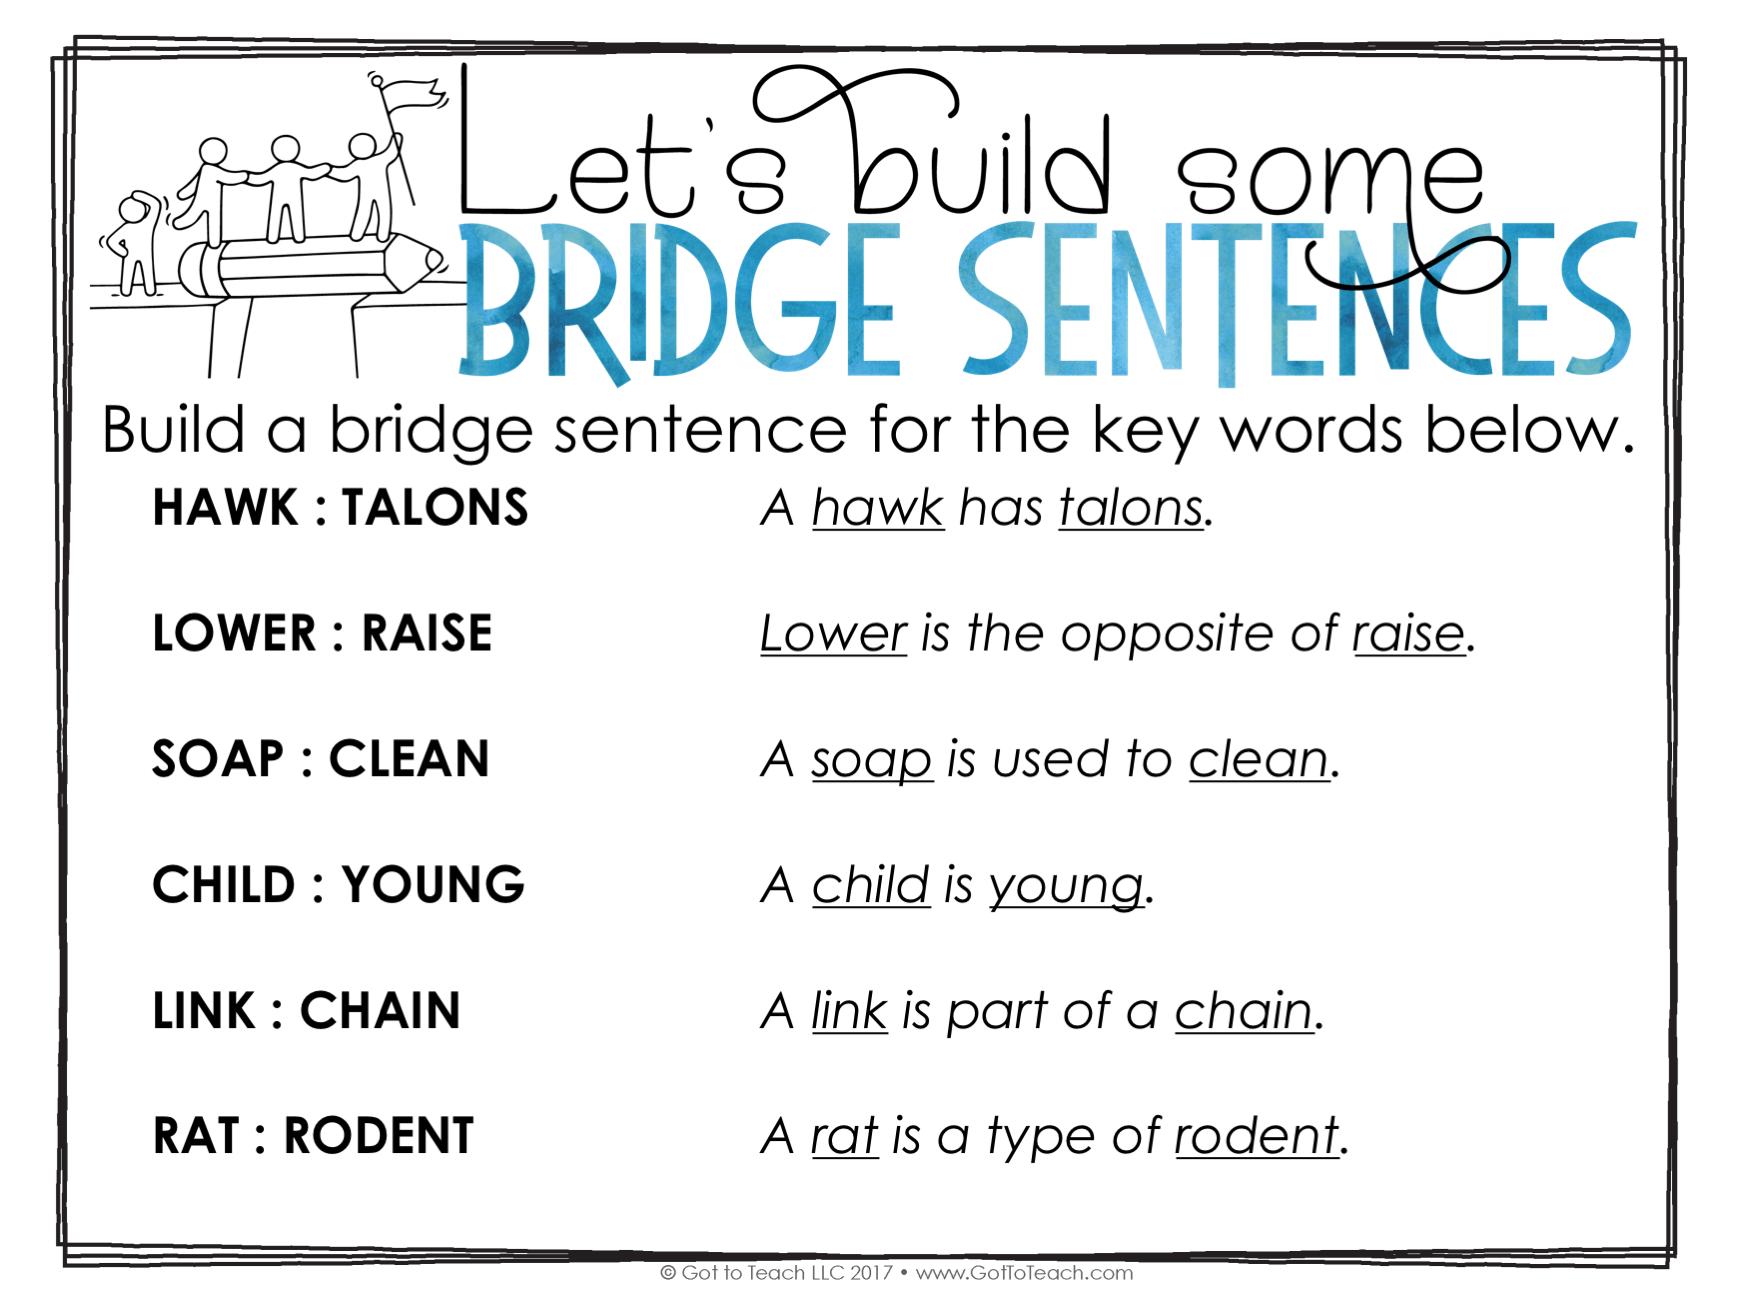 bridge sentence definition